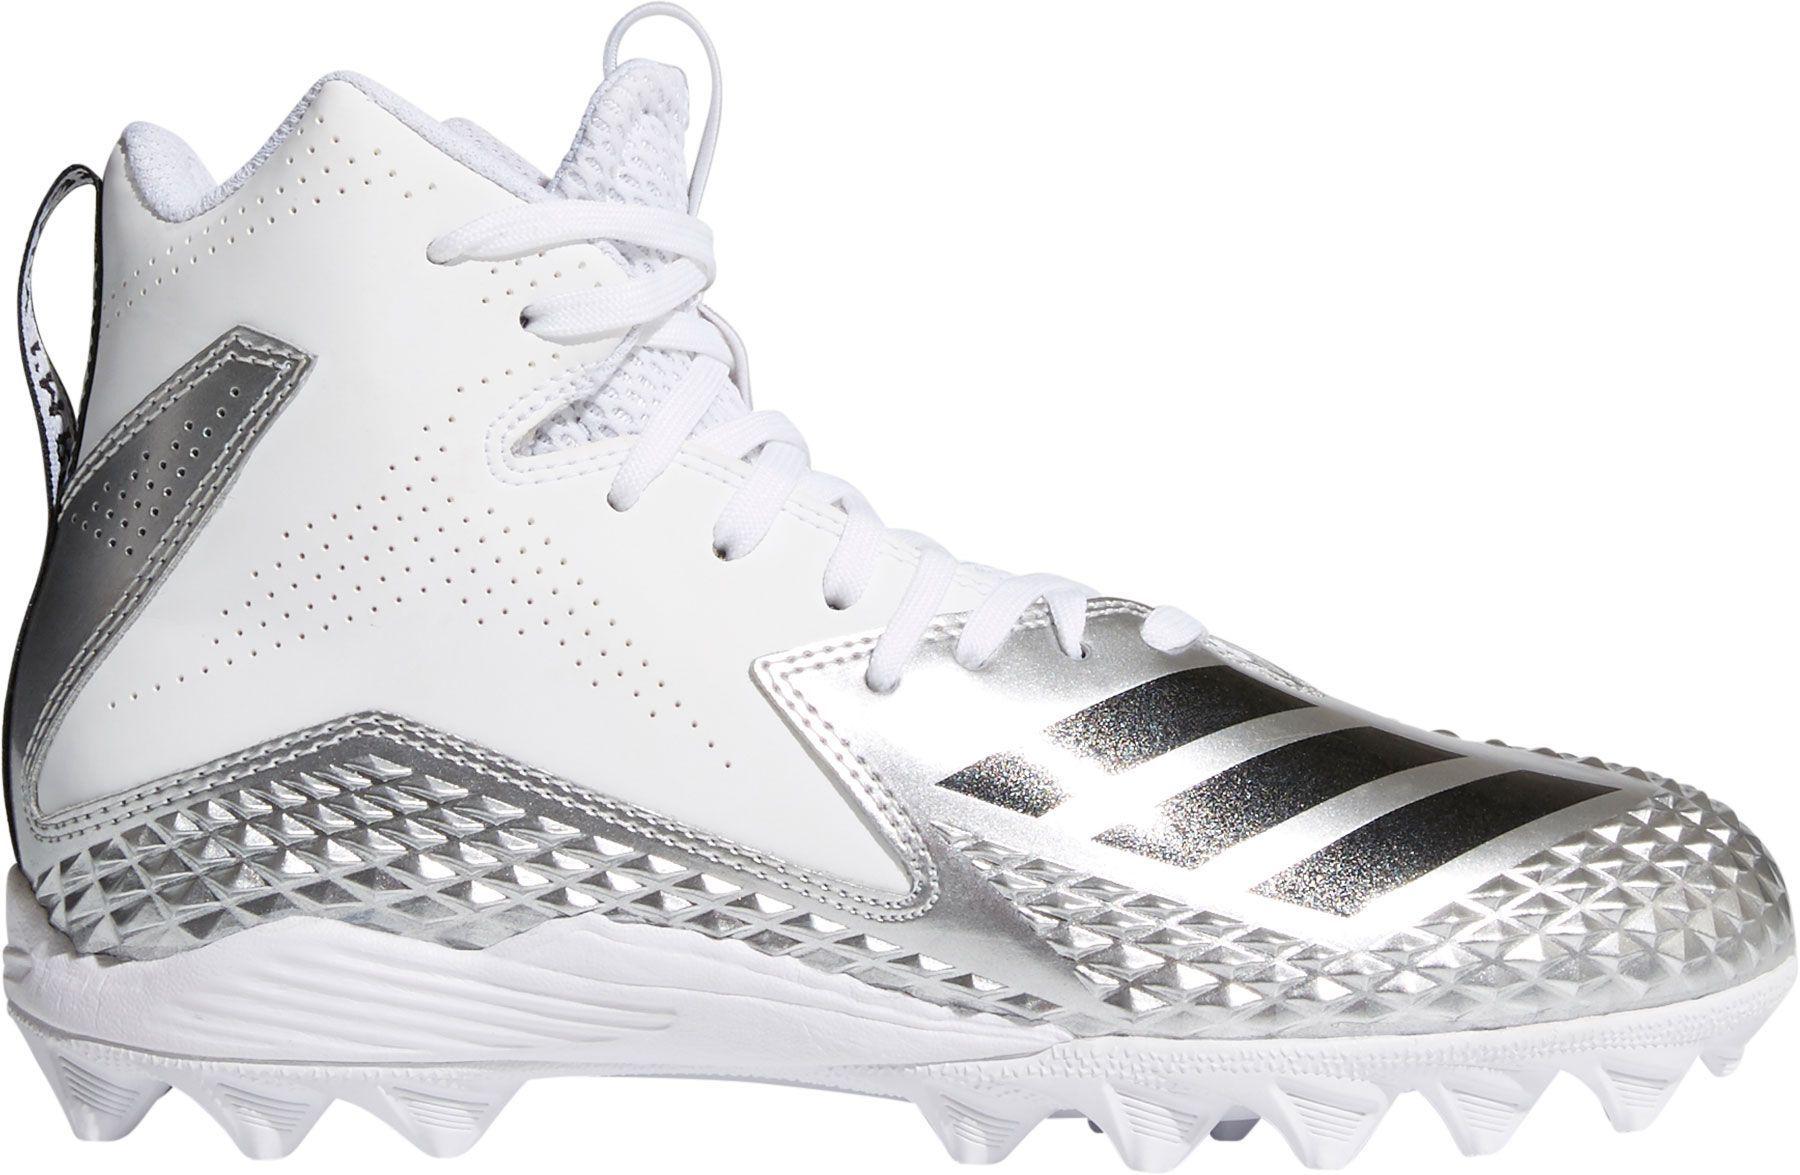 adidas Kids' Freak Mid MD Von Football Cleats, Size: 1.0